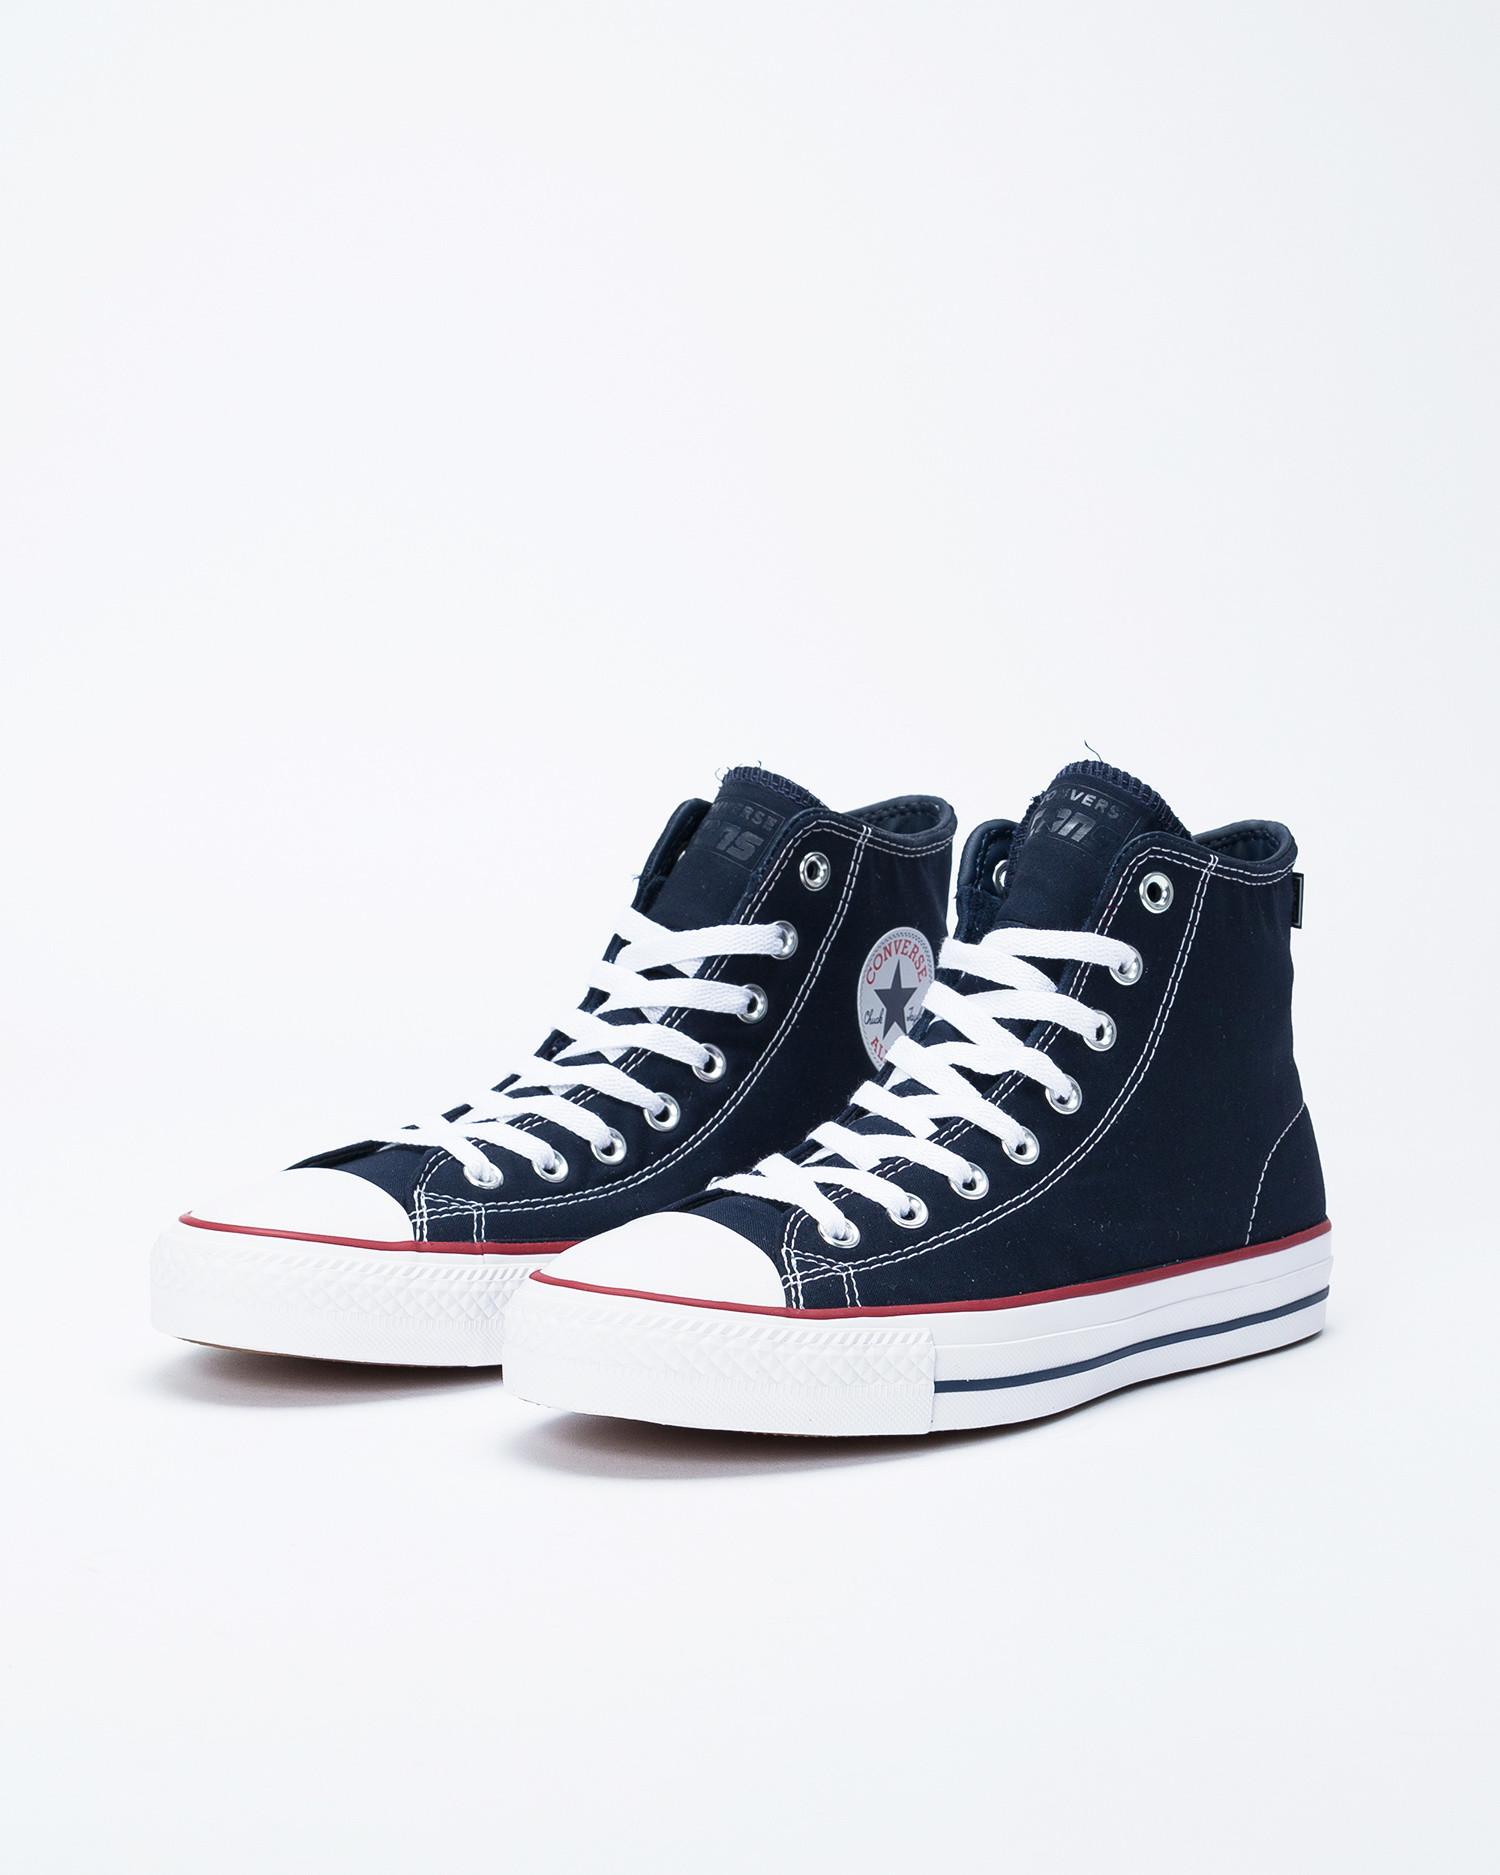 Converse Ctas Hi Pro Obsidian/White/Enamel Red Dark Navy